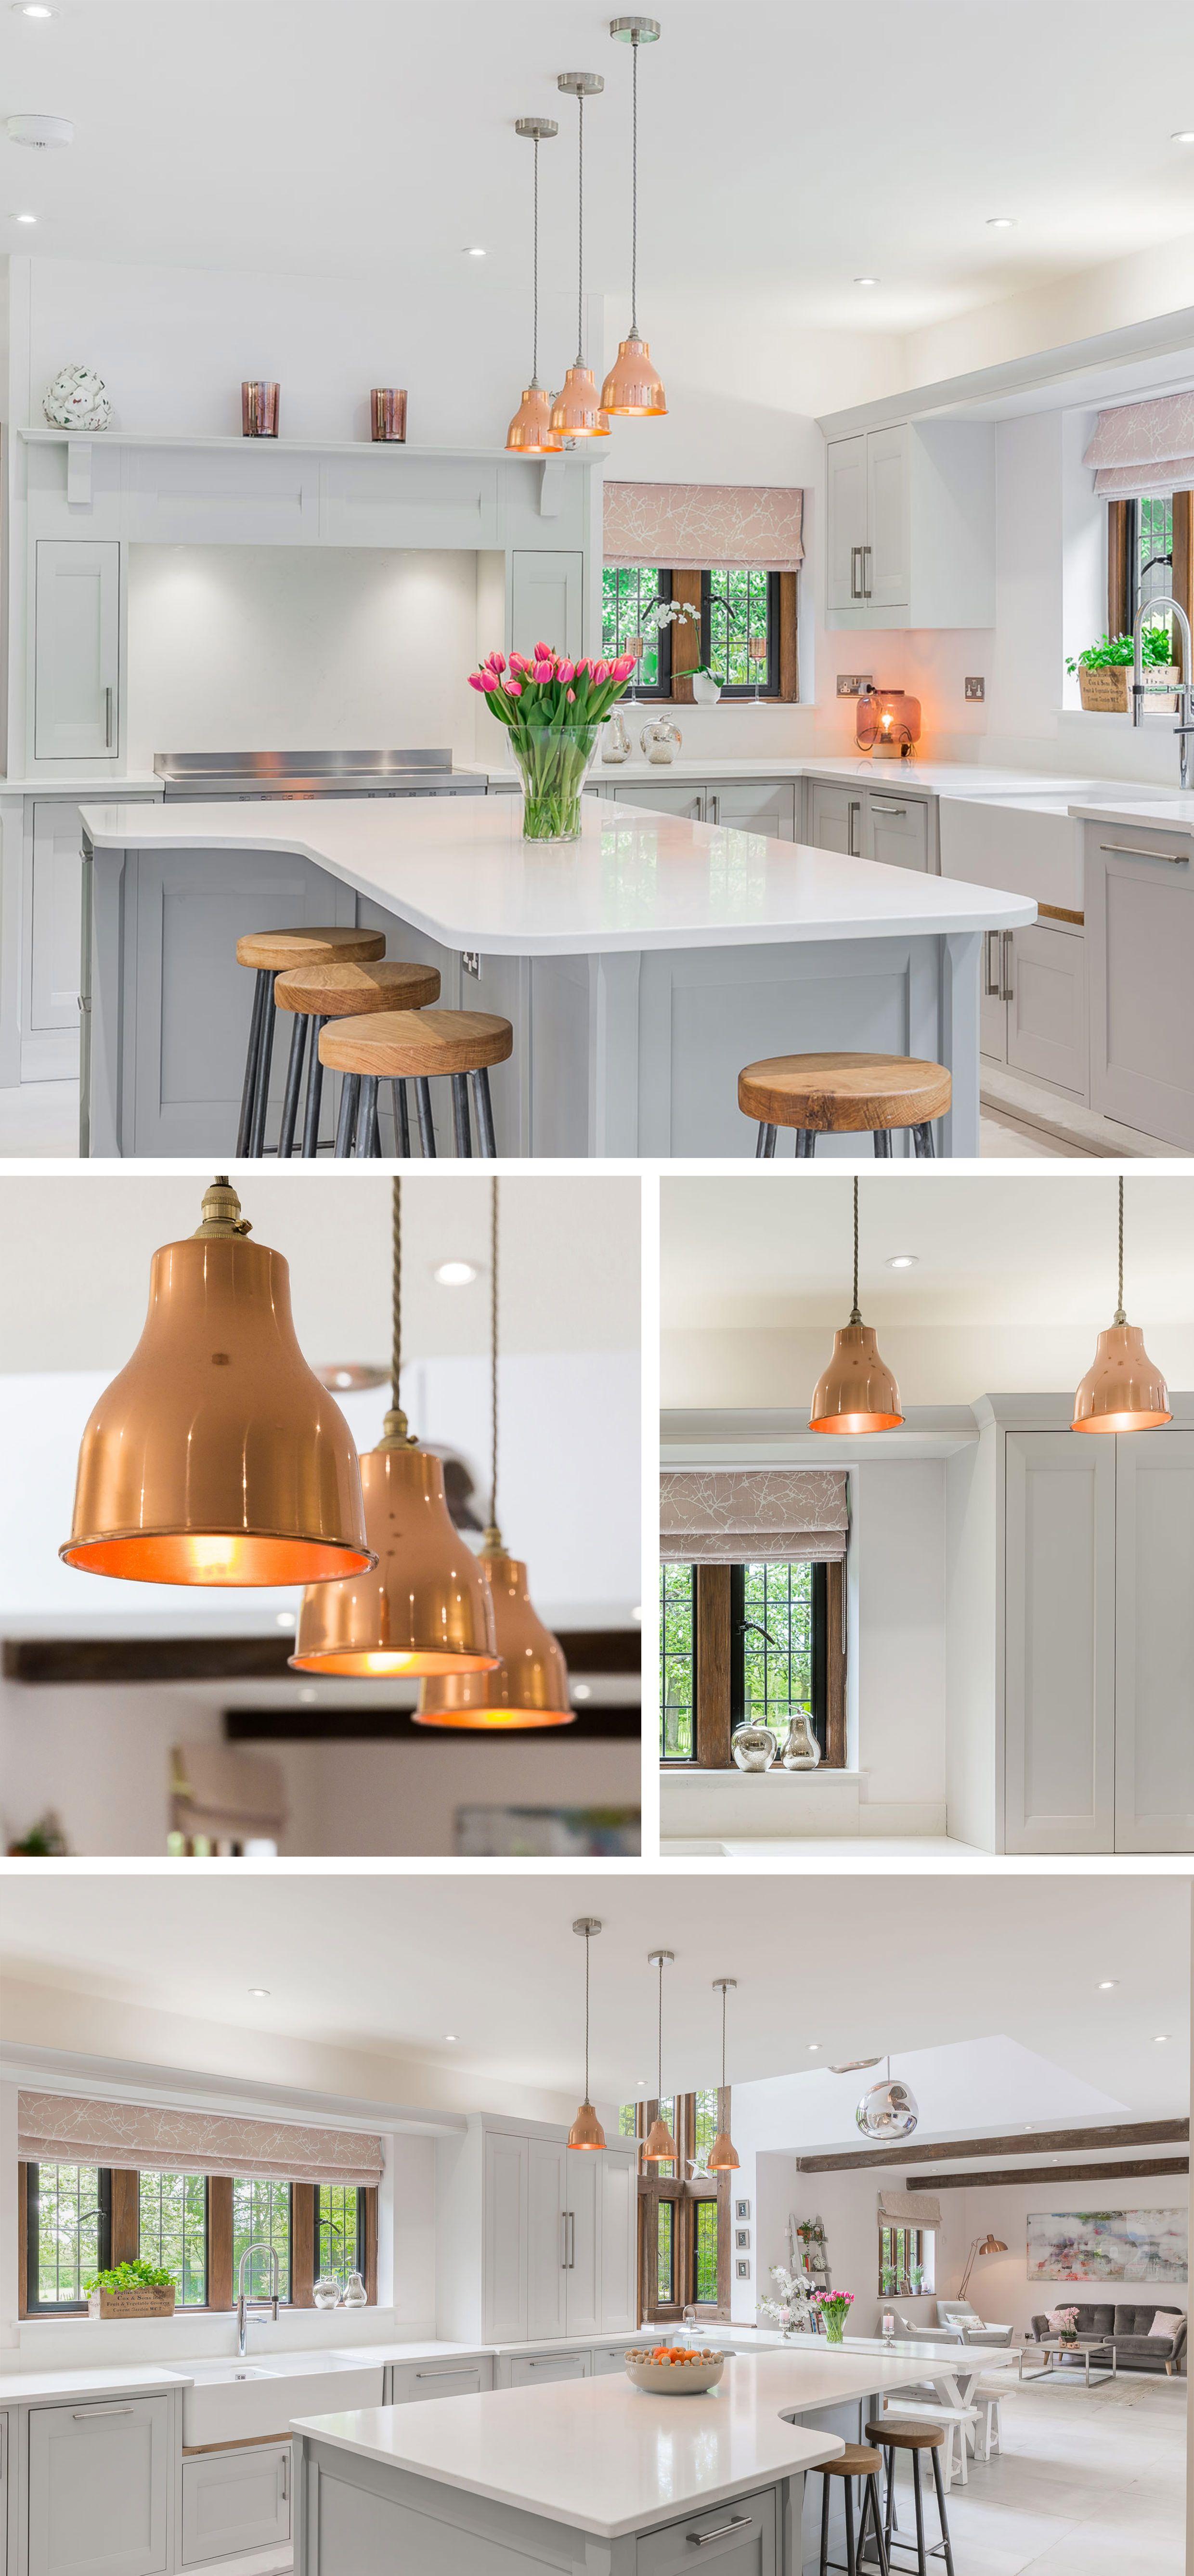 Zoe price interiors contemporary pendants and kitchens